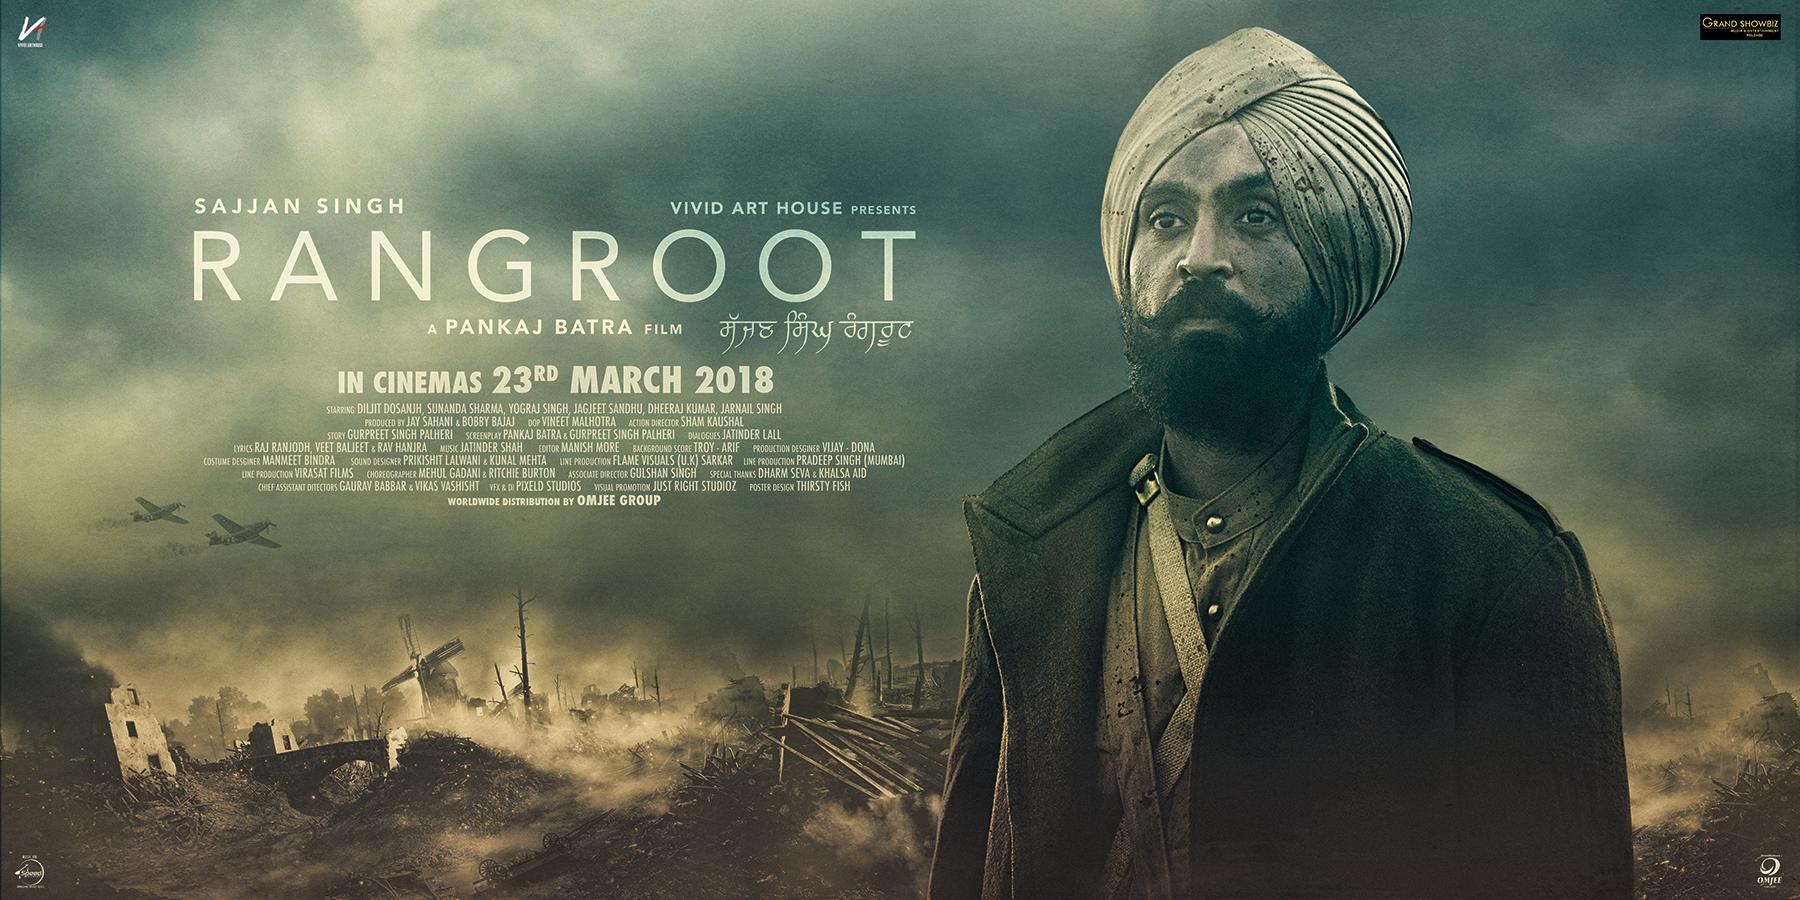 2018 - Sajjan Singh Rangroot (2018) con Diljit Dosanjh + Online 6Sheeter_20x10-Small_Rangroot_gsb-logo